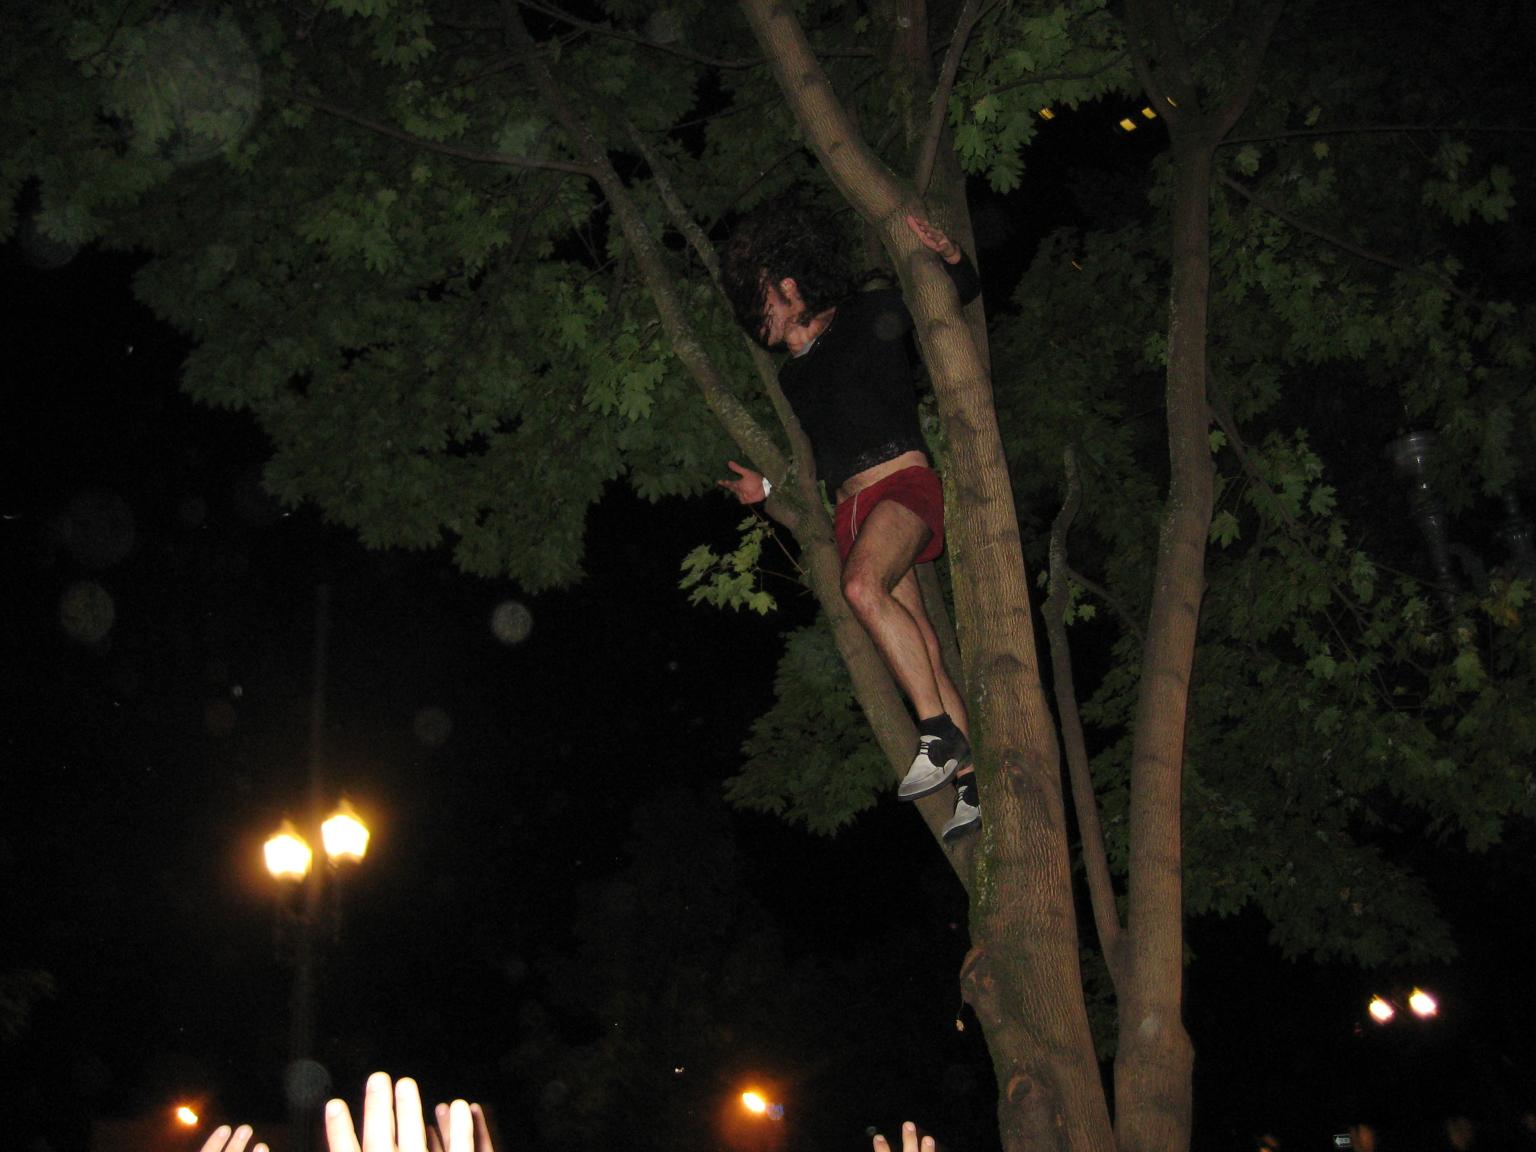 Ami Shalev Climbs A Tree Outside The Club for An Encore